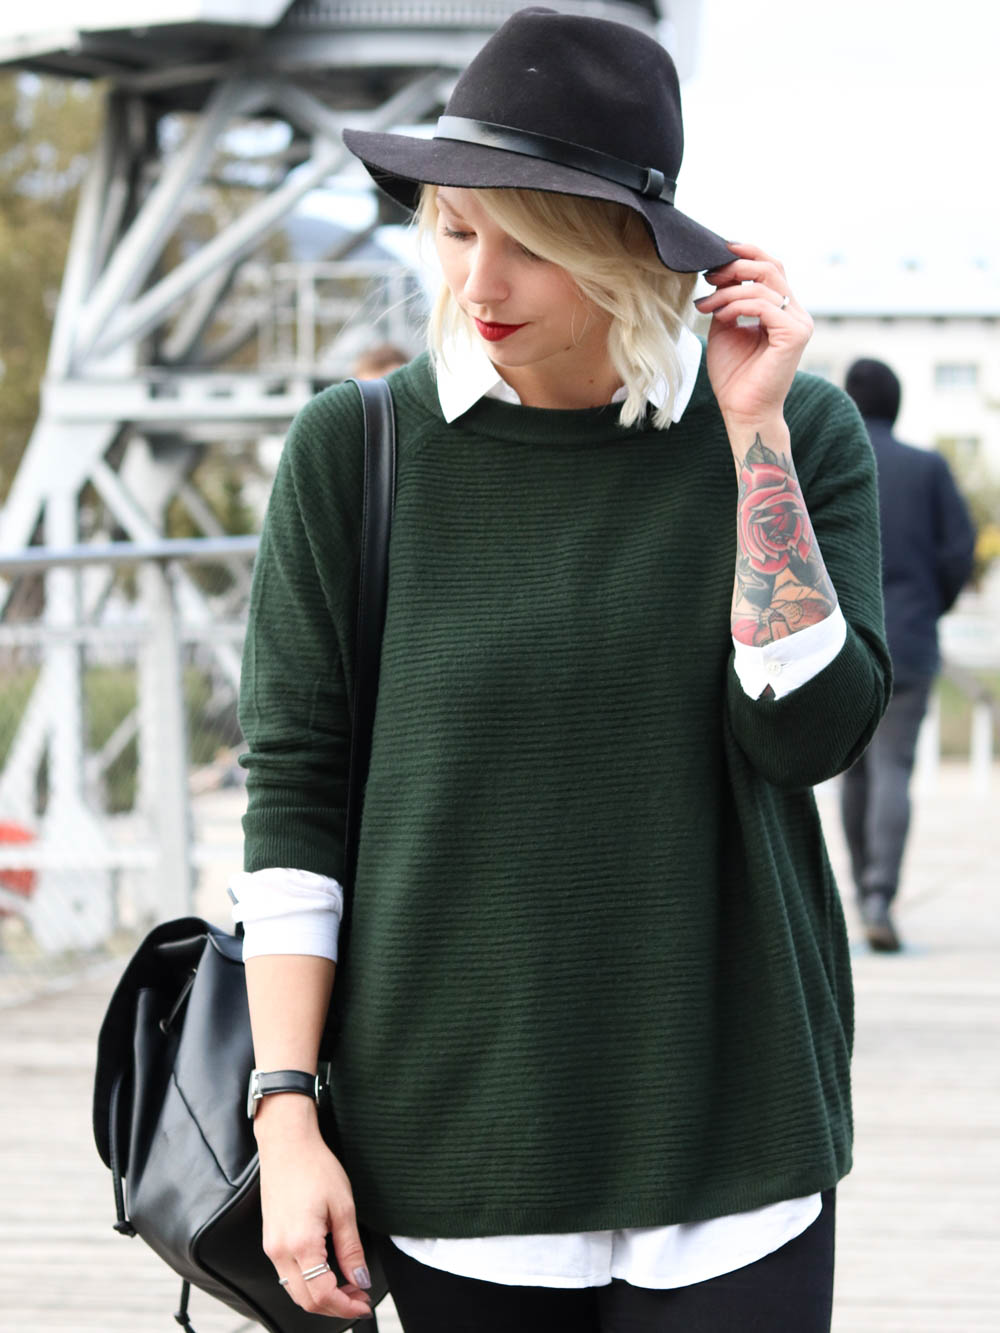 outfit-gruener-strickpullover-weisse-bluse-schwarze-jeans